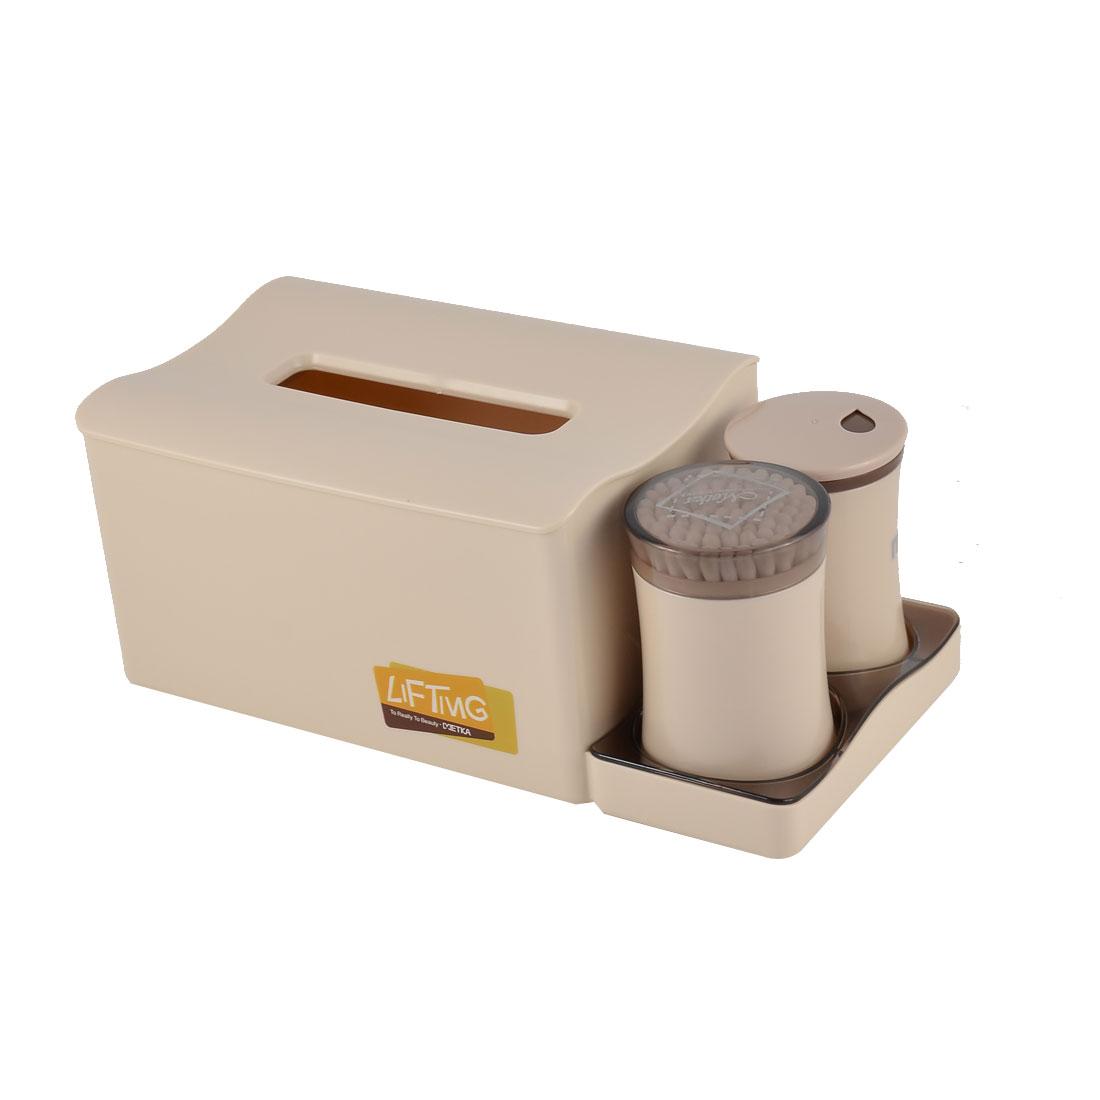 Home Office Dresser Plastic Organizer Holder Toothpicks Cotton Swabs Tissue Box Set Khaki